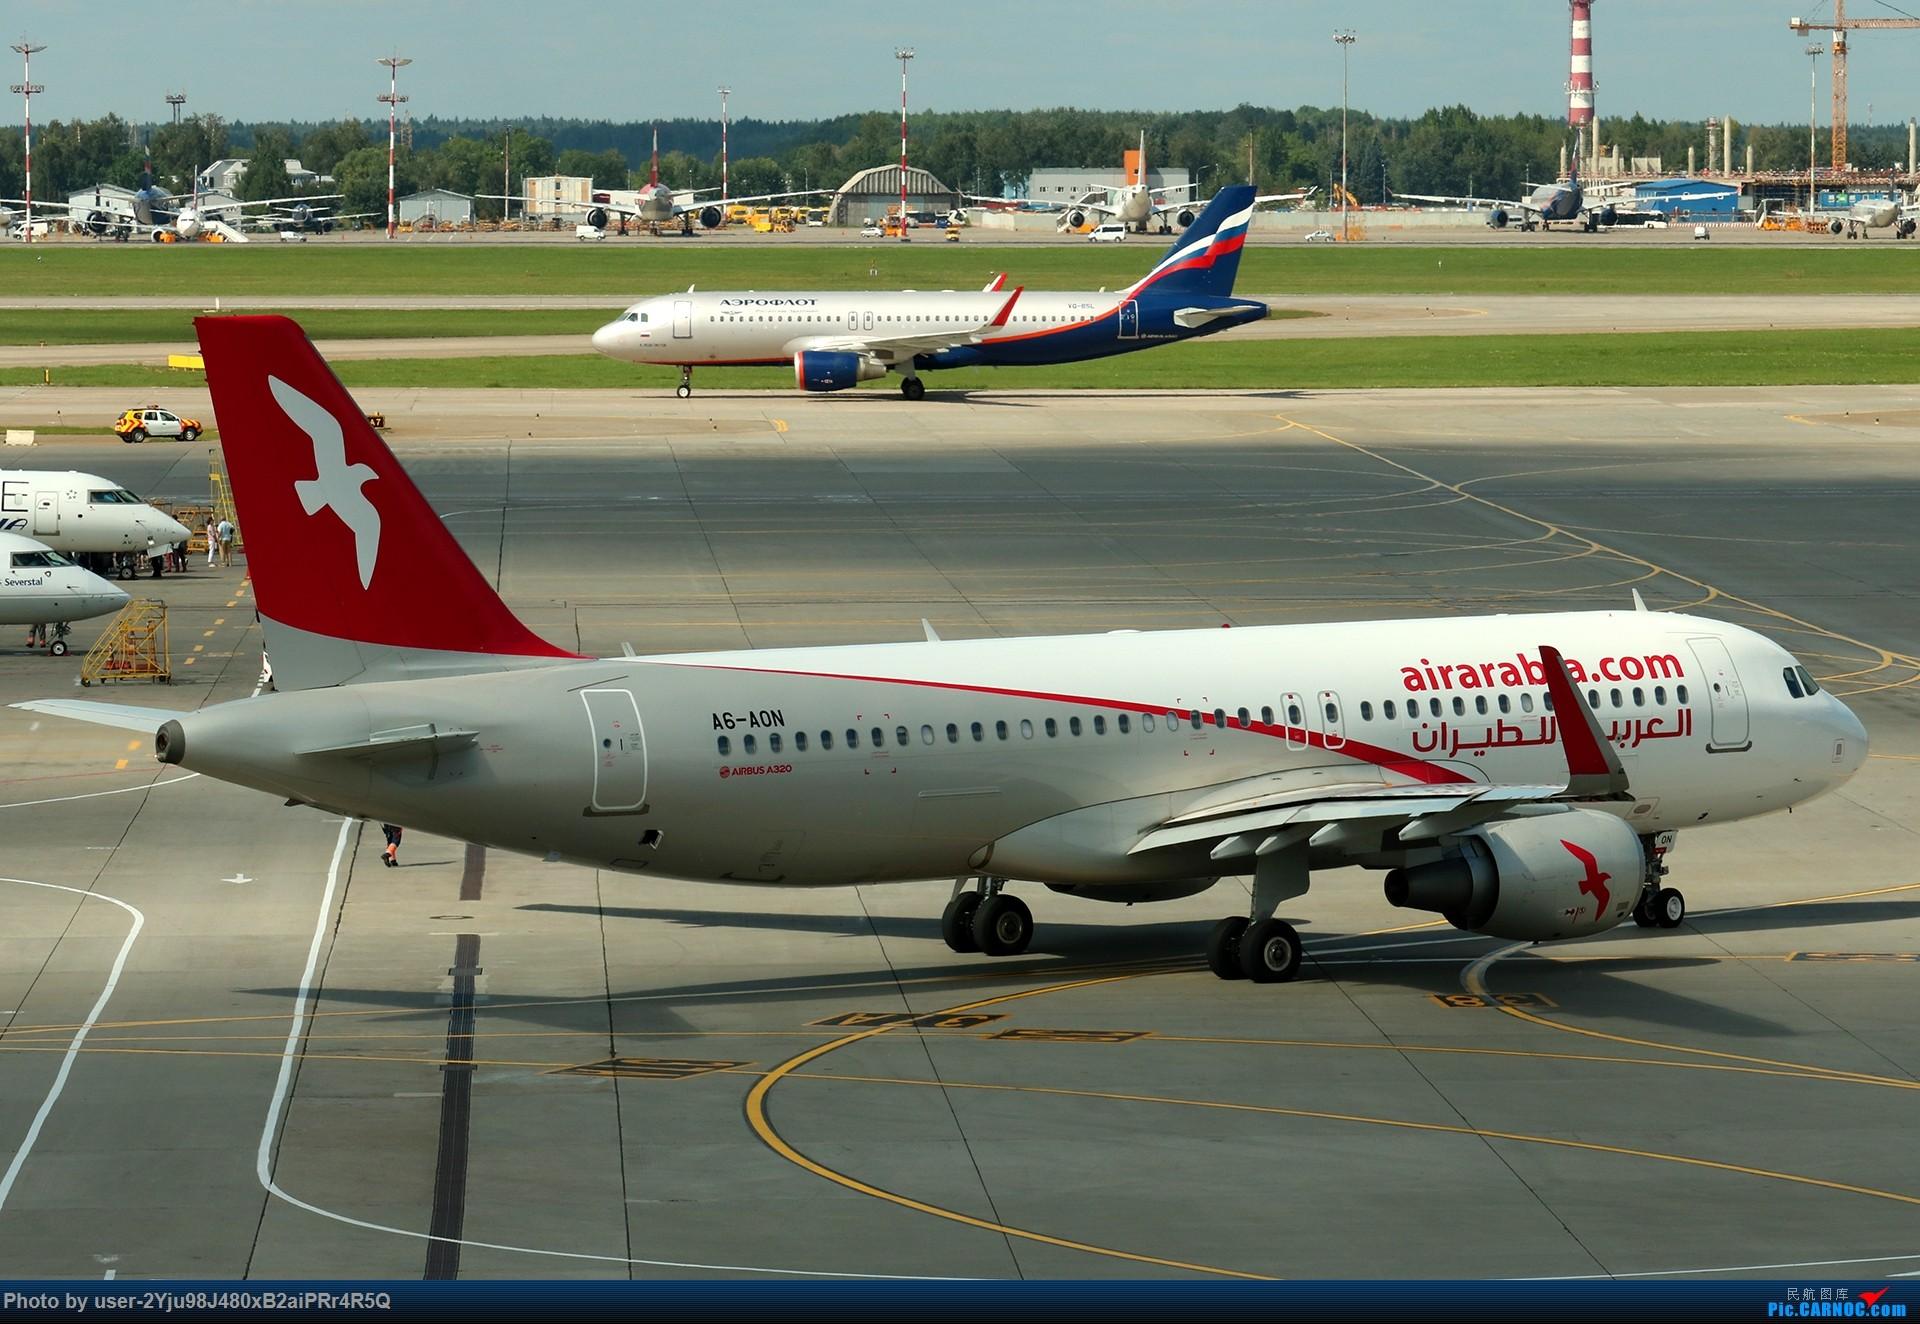 Re:[原创]LIULIU|Sheremetyevo的漫游|其他篇 AIRBUS A320-214(SL) A6-AON 俄罗斯谢诺梅杰沃机场